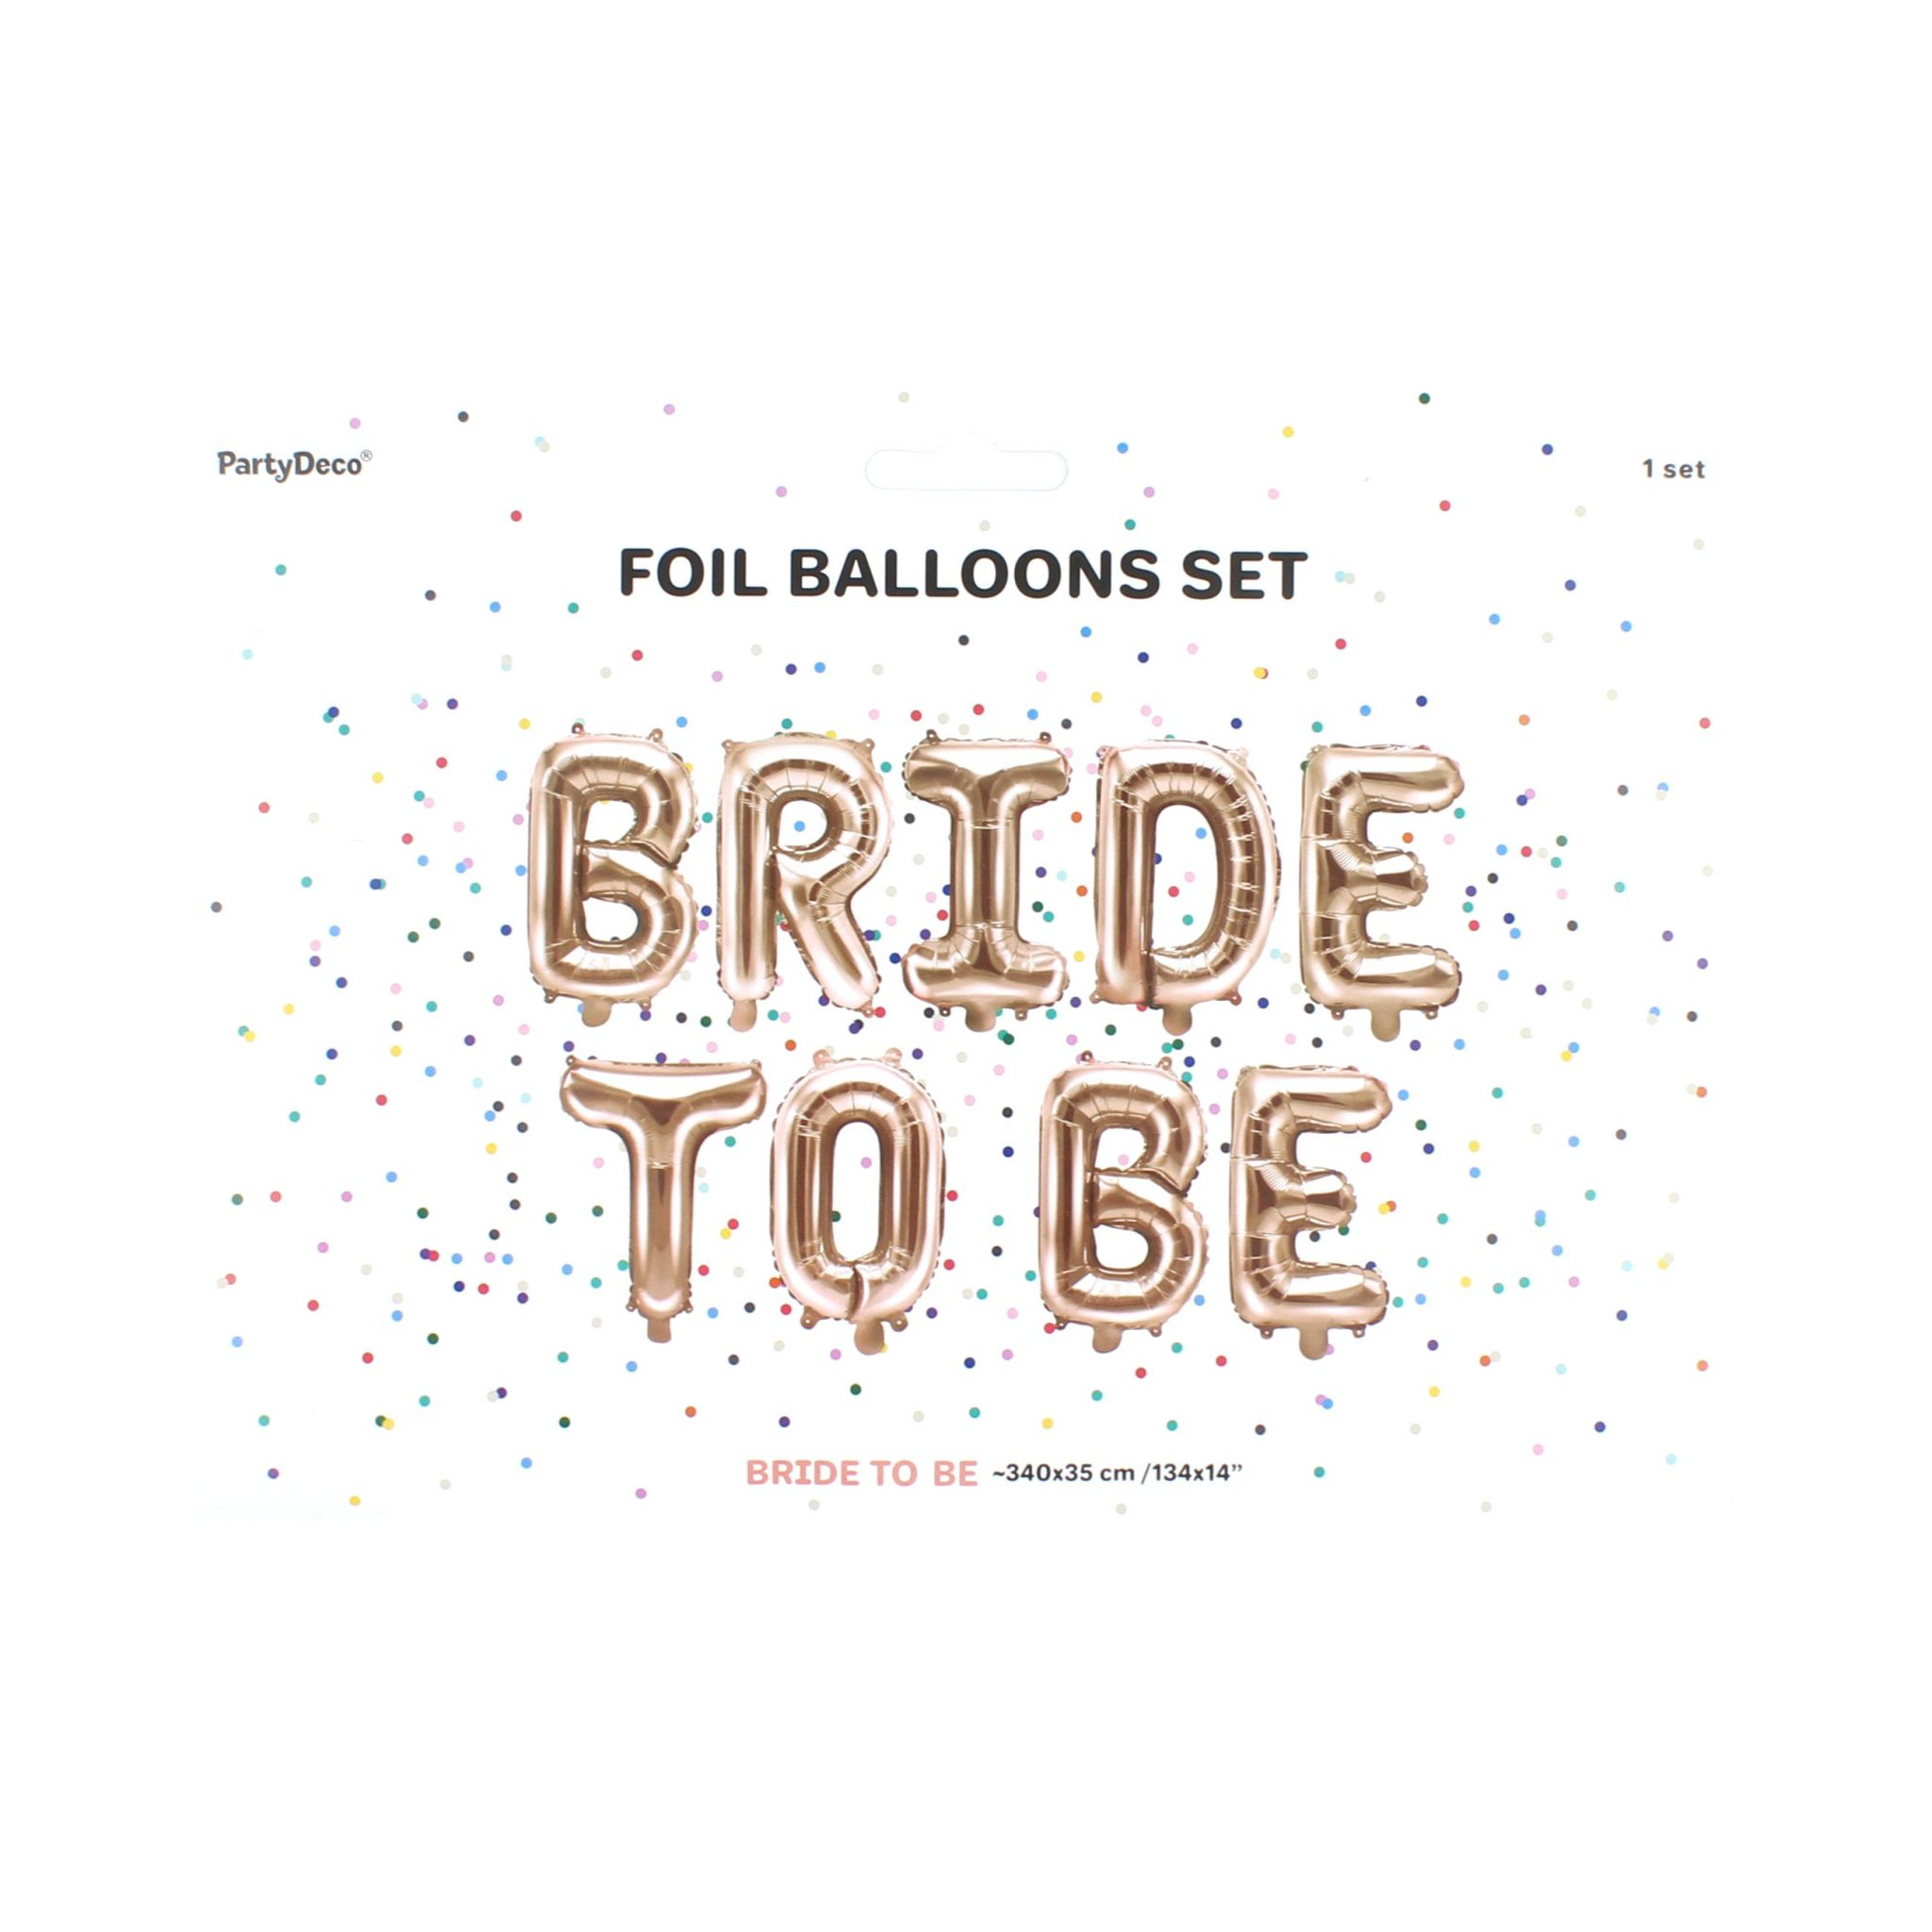 Balon Bride to be 340x35 cm